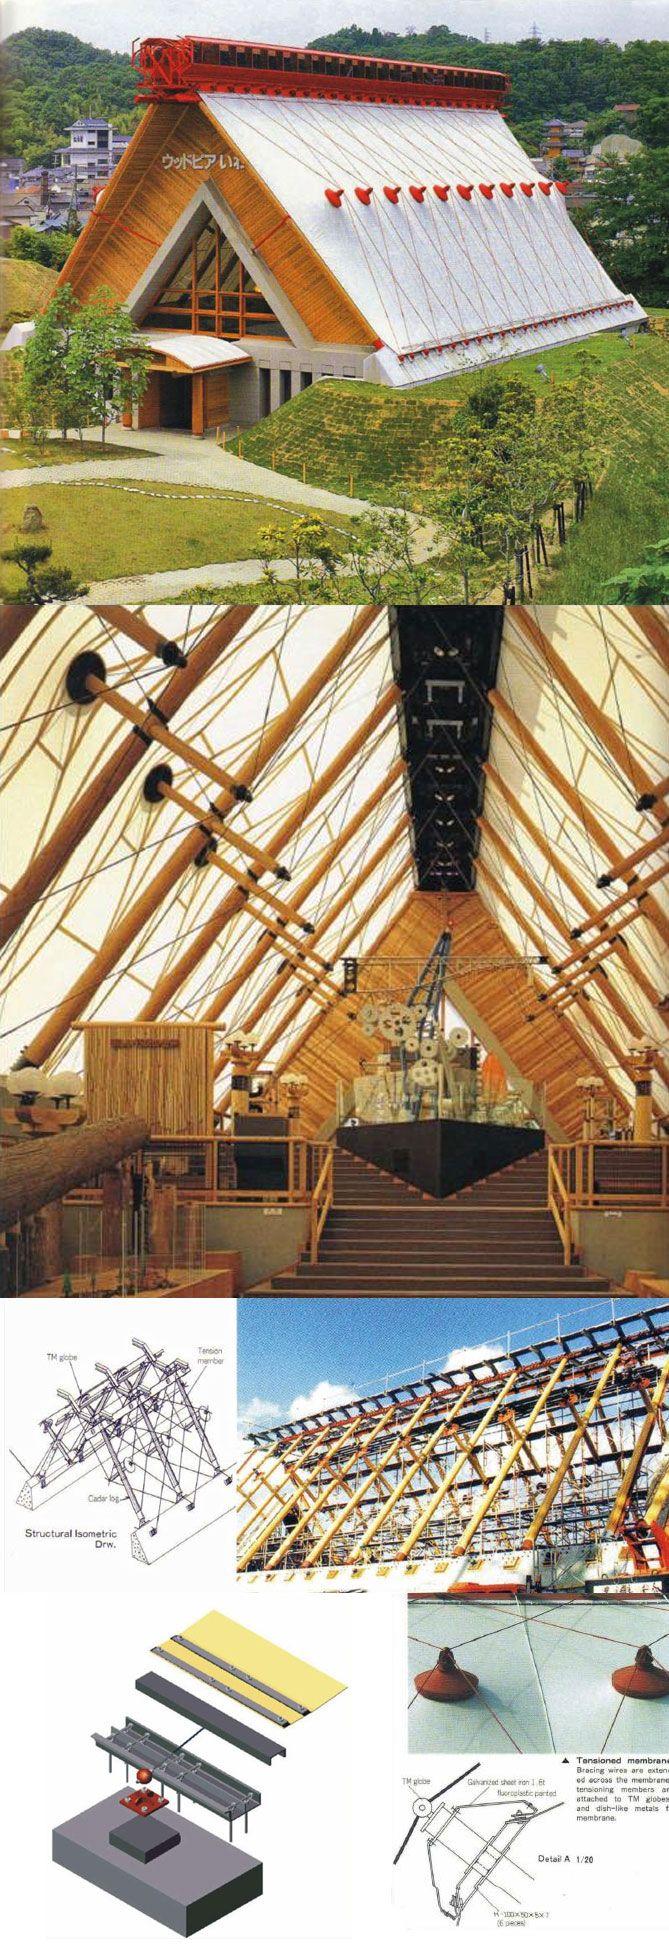 Woodpia Iwaki Museum, Iwaki, Fukushima, Japan. Nikken Sekkei (1989). Image Source: http://issuu.com/tallerbioarq/docs/tensoestructuras